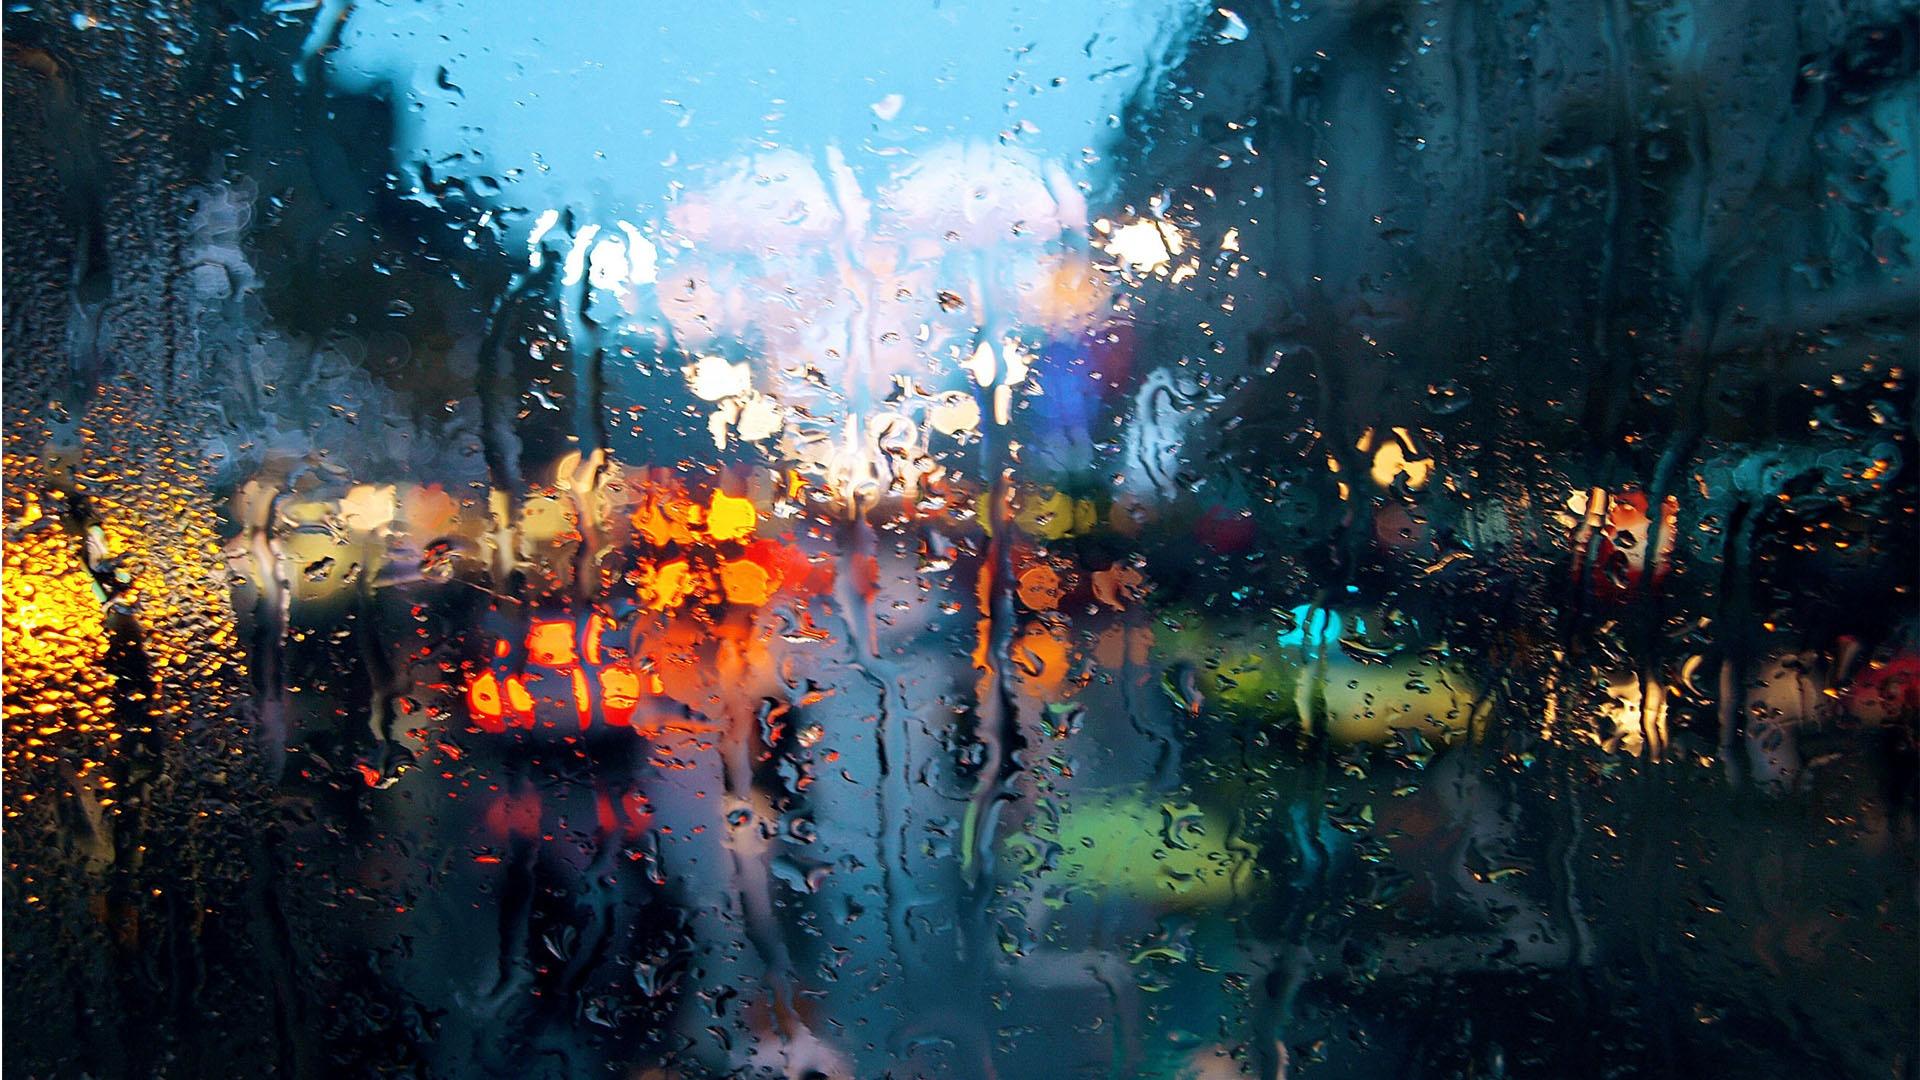 city-traffic-in-the-rain-hd-wallpaper-89915